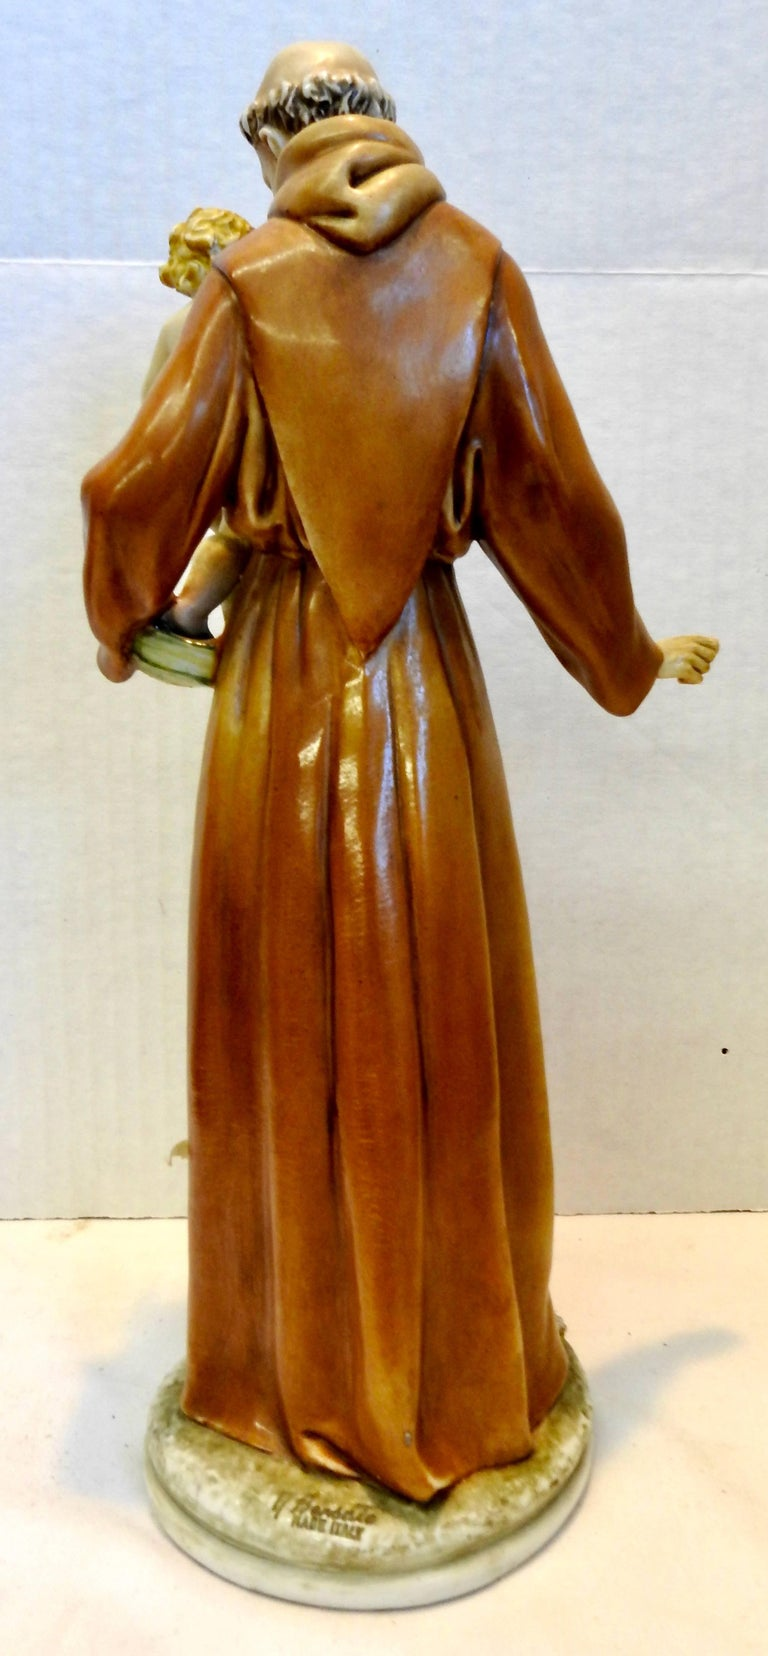 Glazed Midcentury Porcelain Saint Anthony by Antonia Borsato For Sale